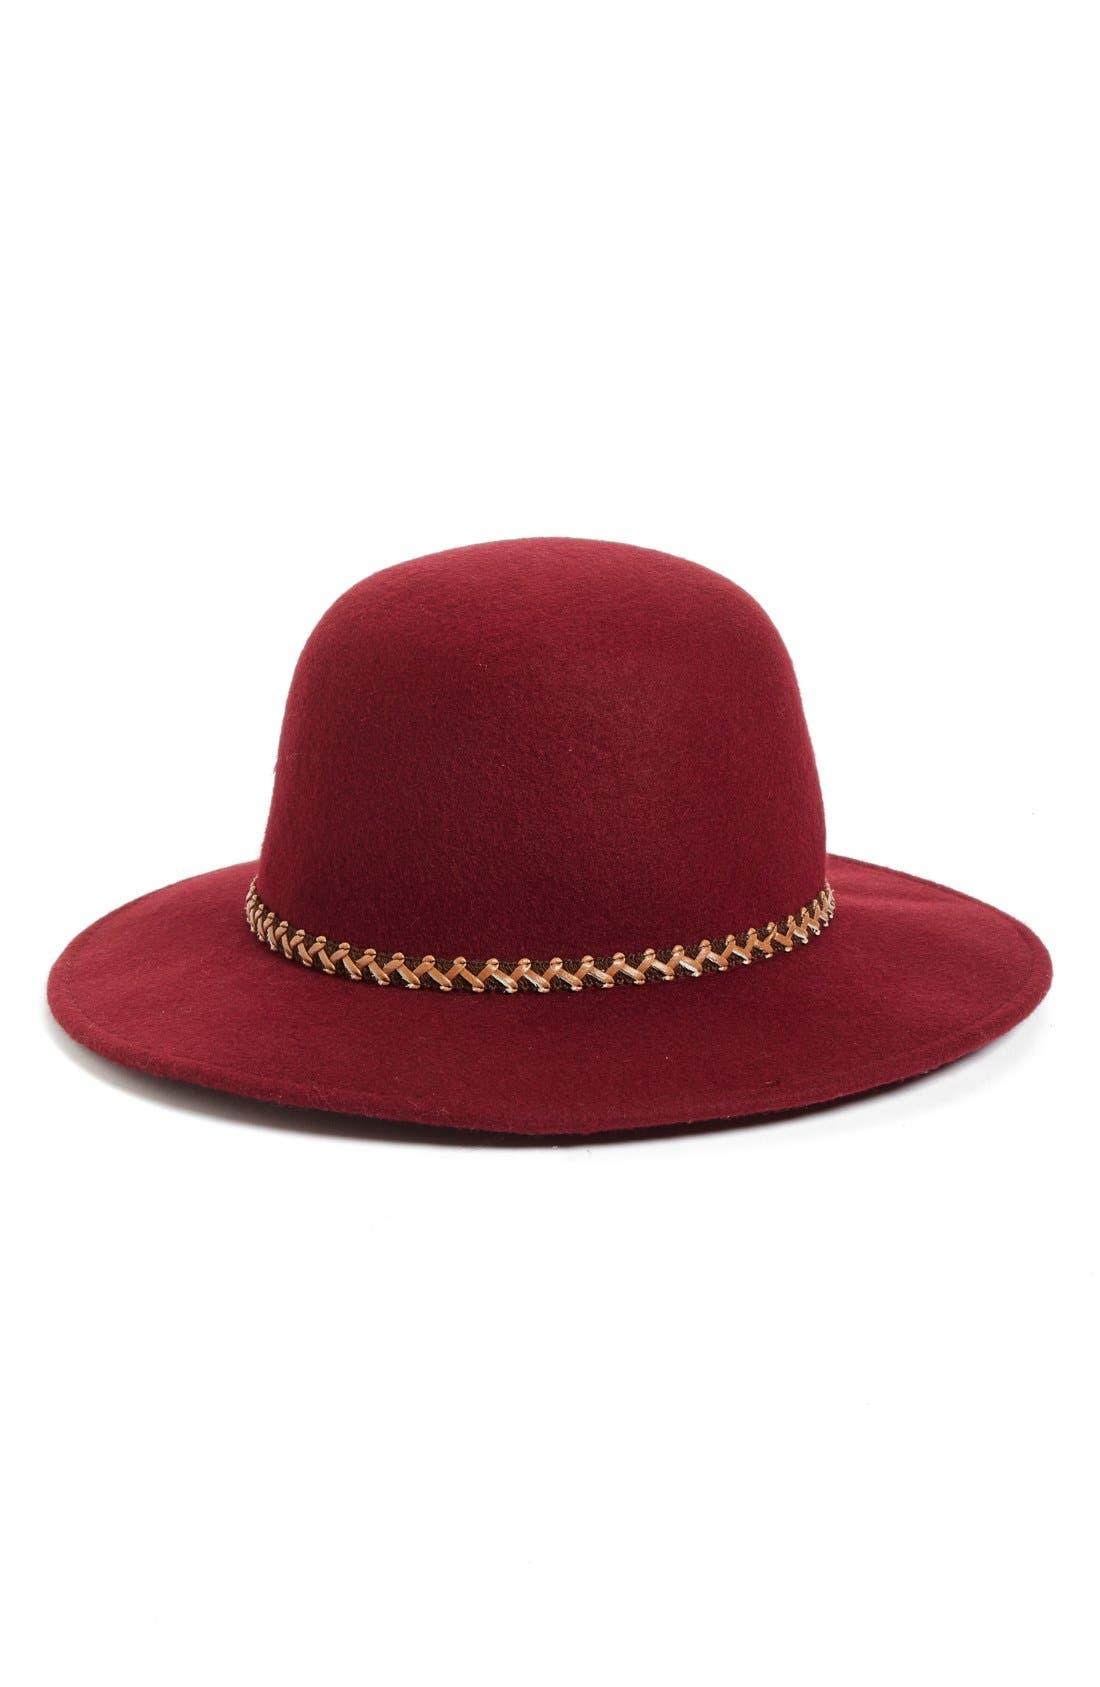 Alternate Image 1 Selected - August Hat Wool Hat